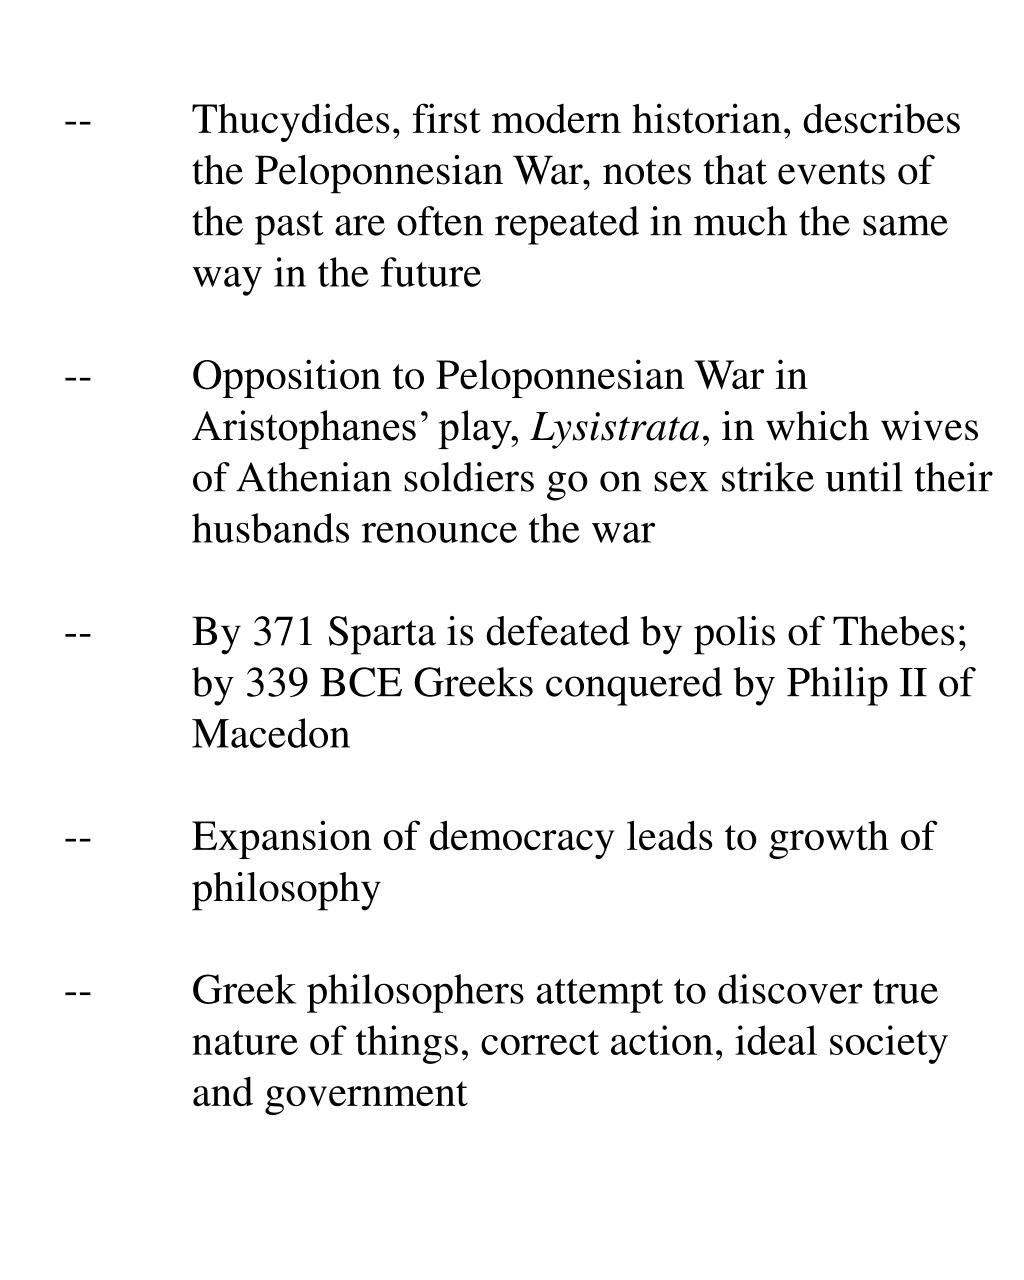 --Thucydides, first modern historian, describes